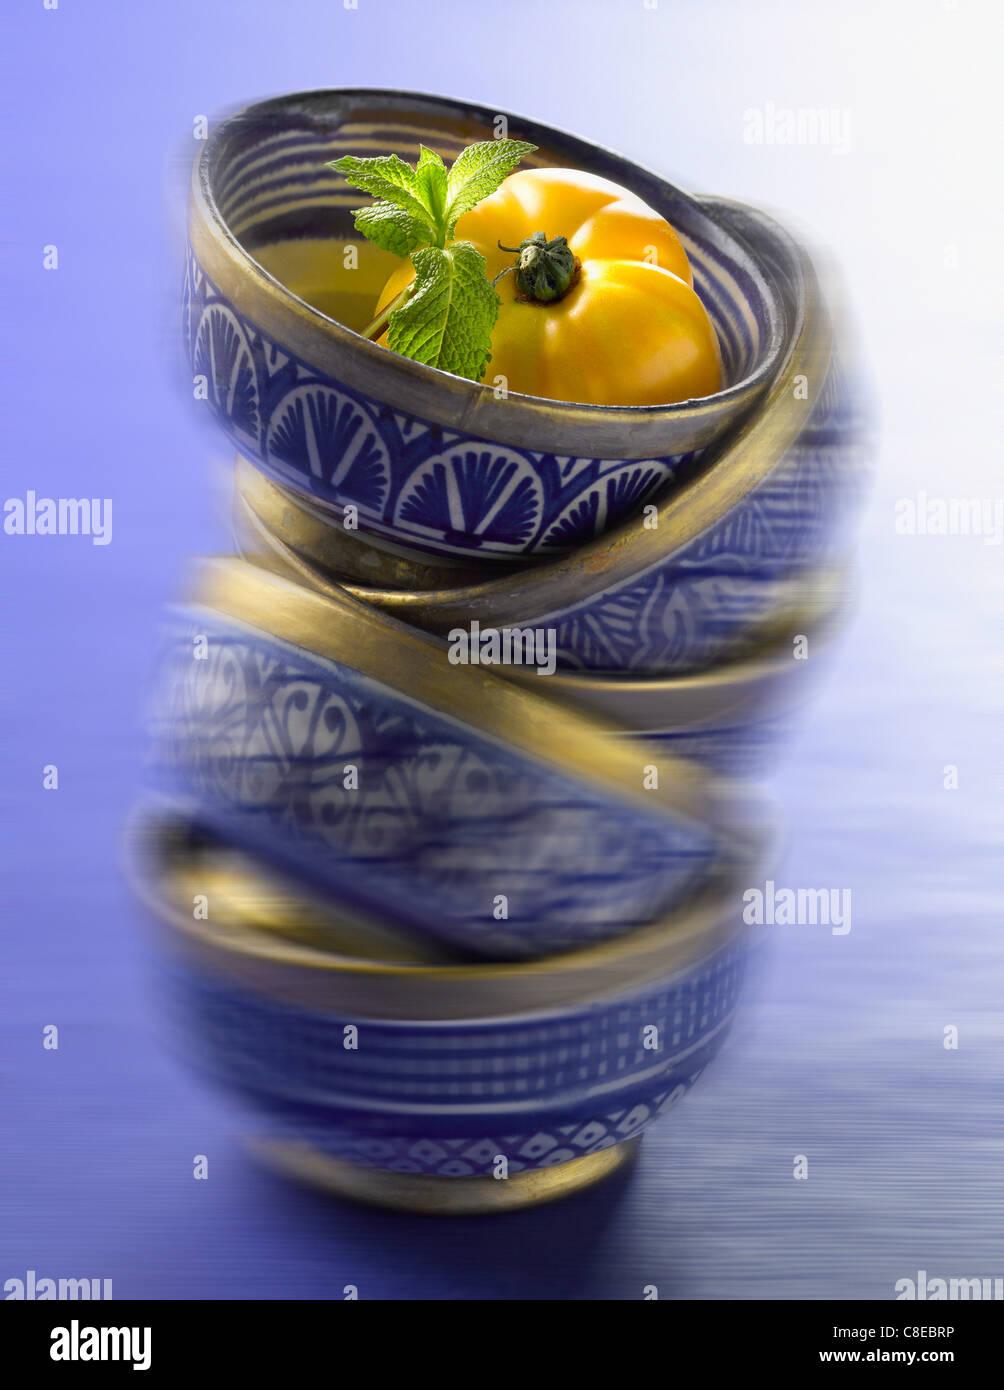 Tazones de sopa Imagen De Stock